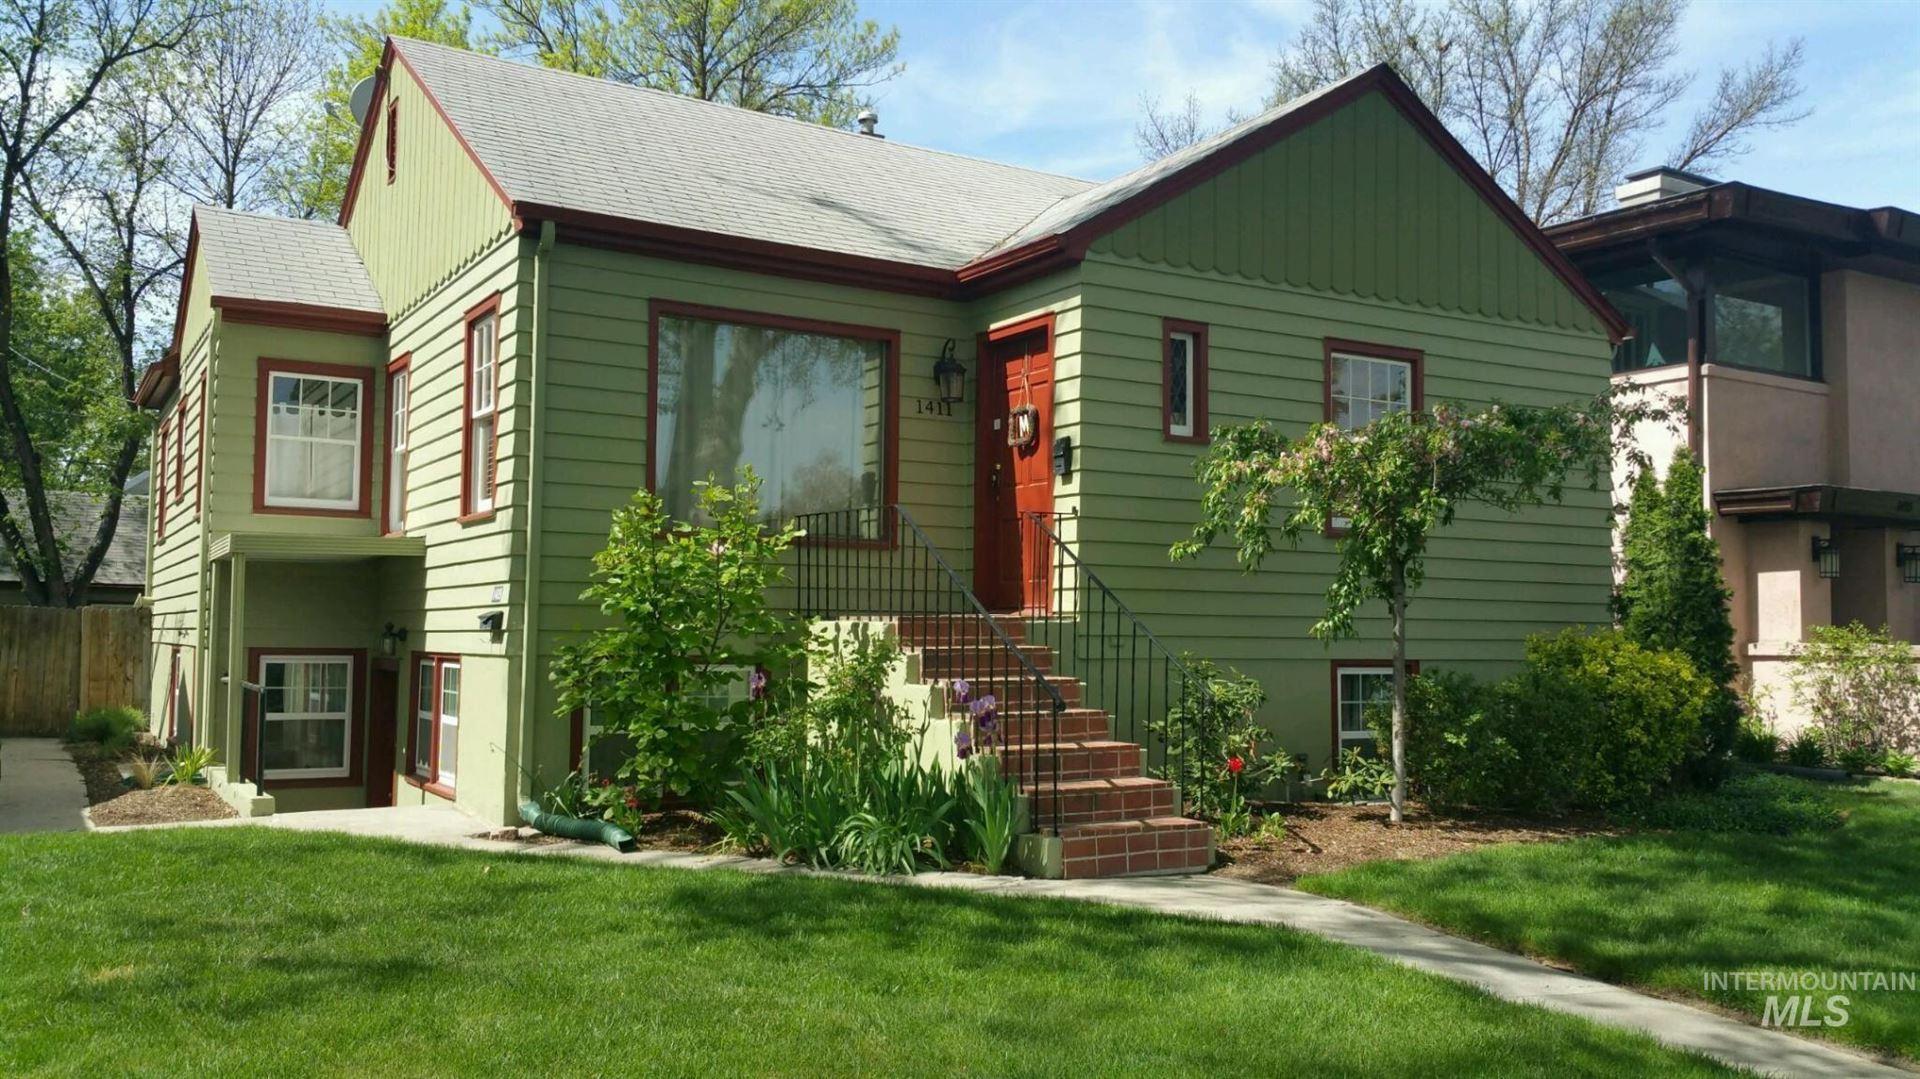 1411 W Fort St, Boise, ID 83702 - MLS#: 98811286